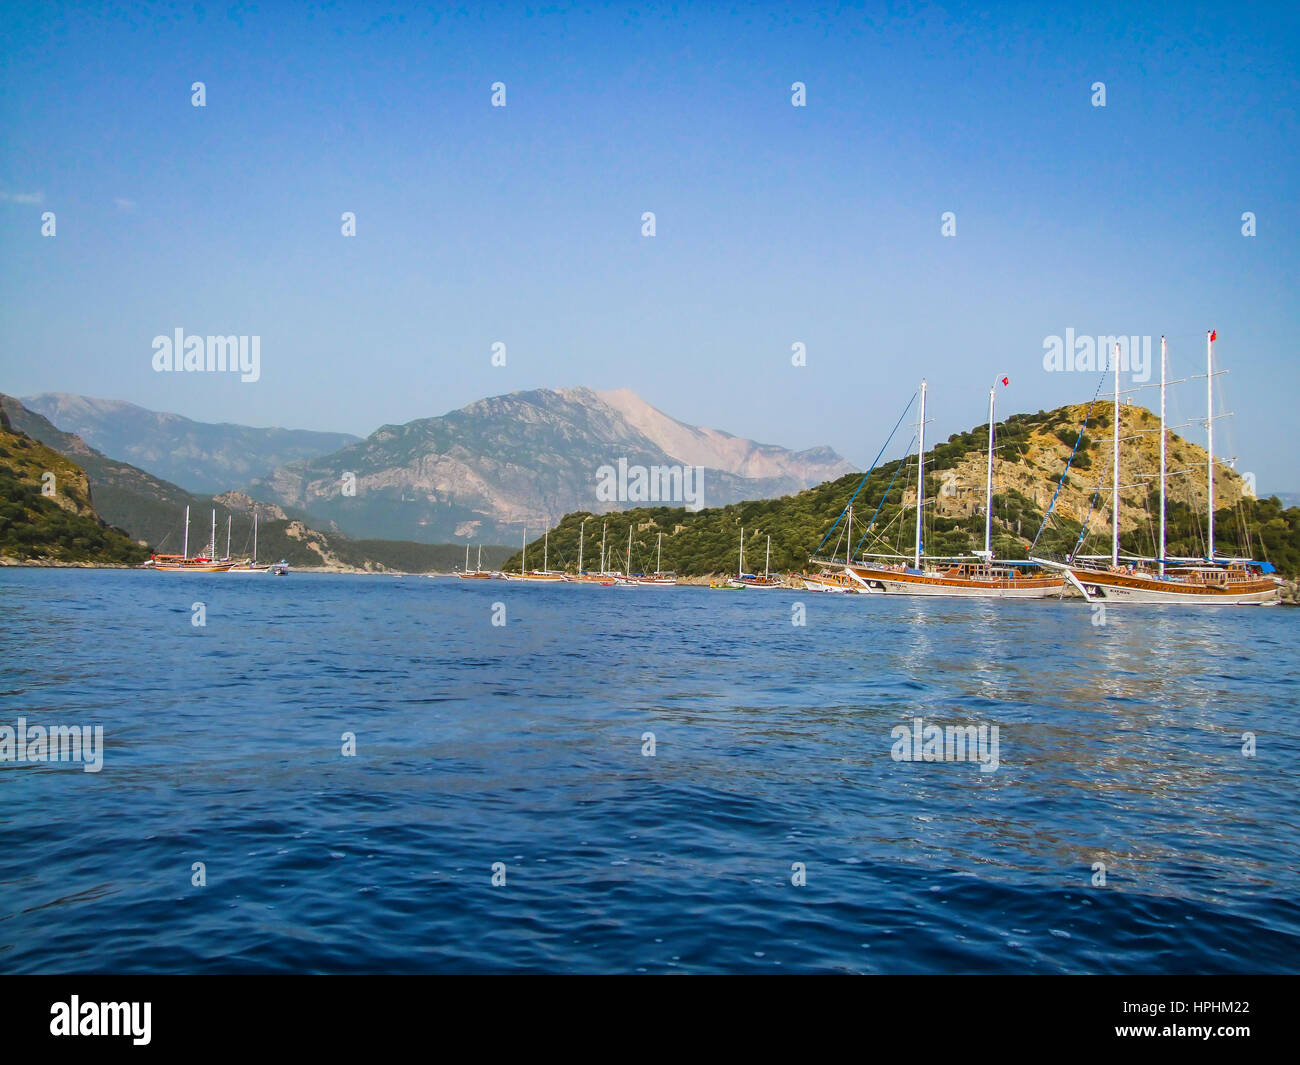 Yacht cruise Fethiye Turkey,private yacht  cruising,boats anchored by the island, mavi yolculuk,ozel tekne, adaya - Stock Image